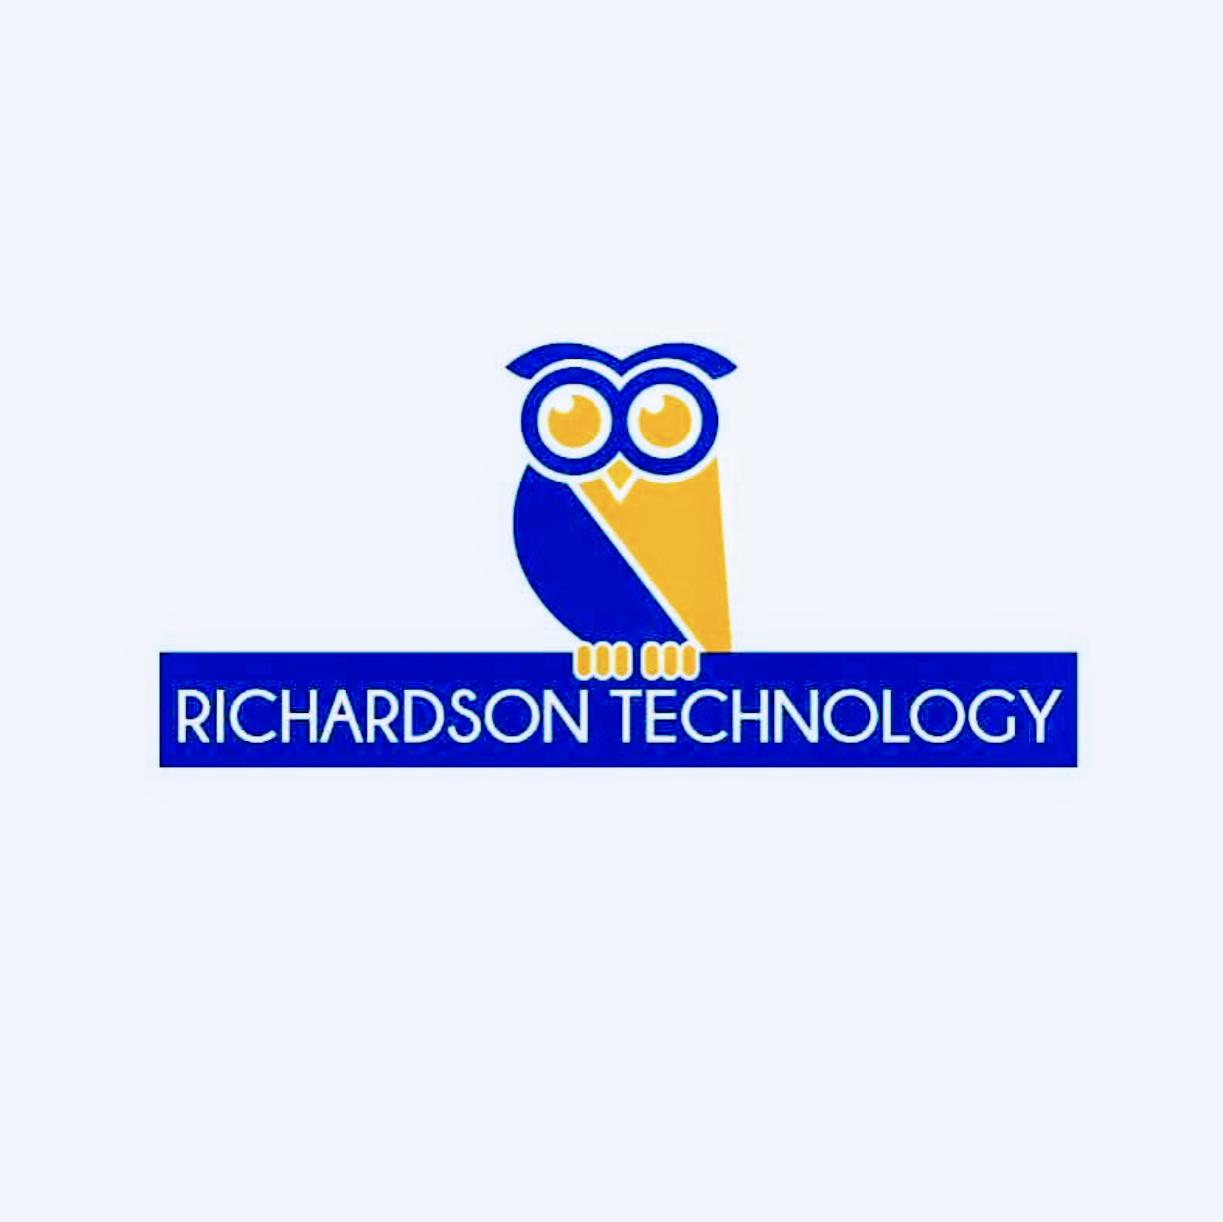 Richardson Technology LLC